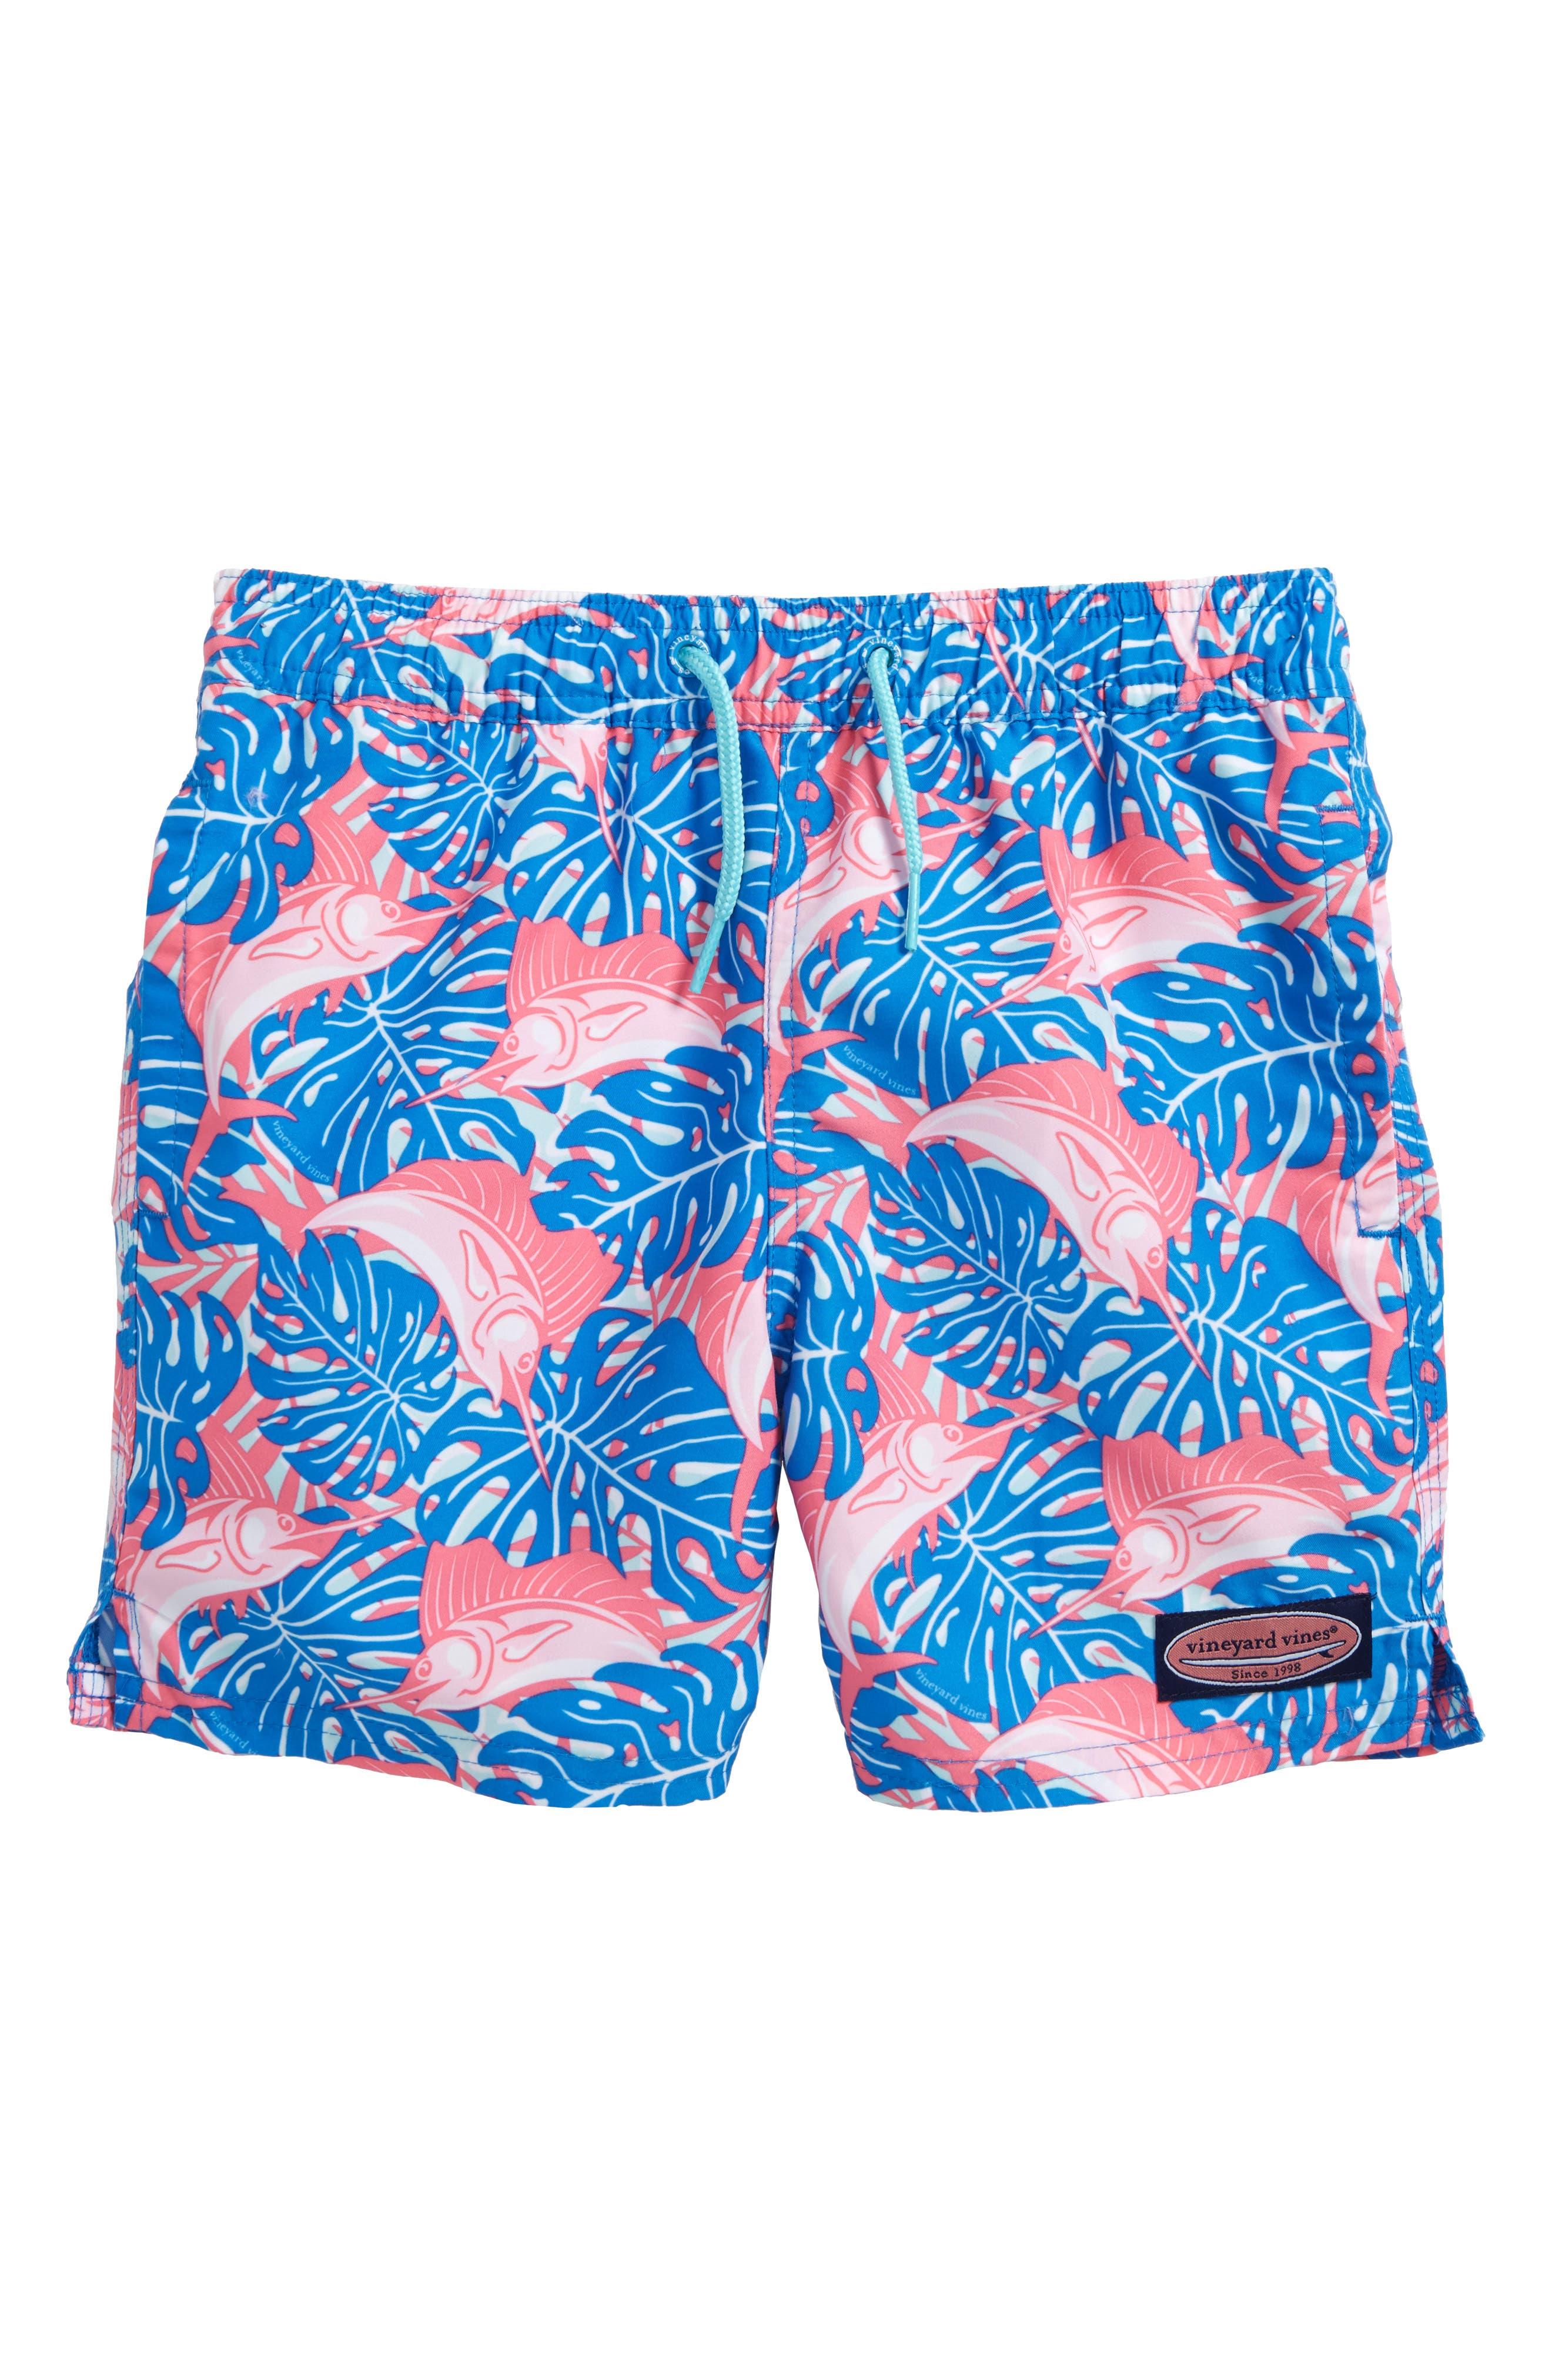 Chappy Sailfish & Leaves Swim Trunks,                             Main thumbnail 1, color,                             Azure Blue